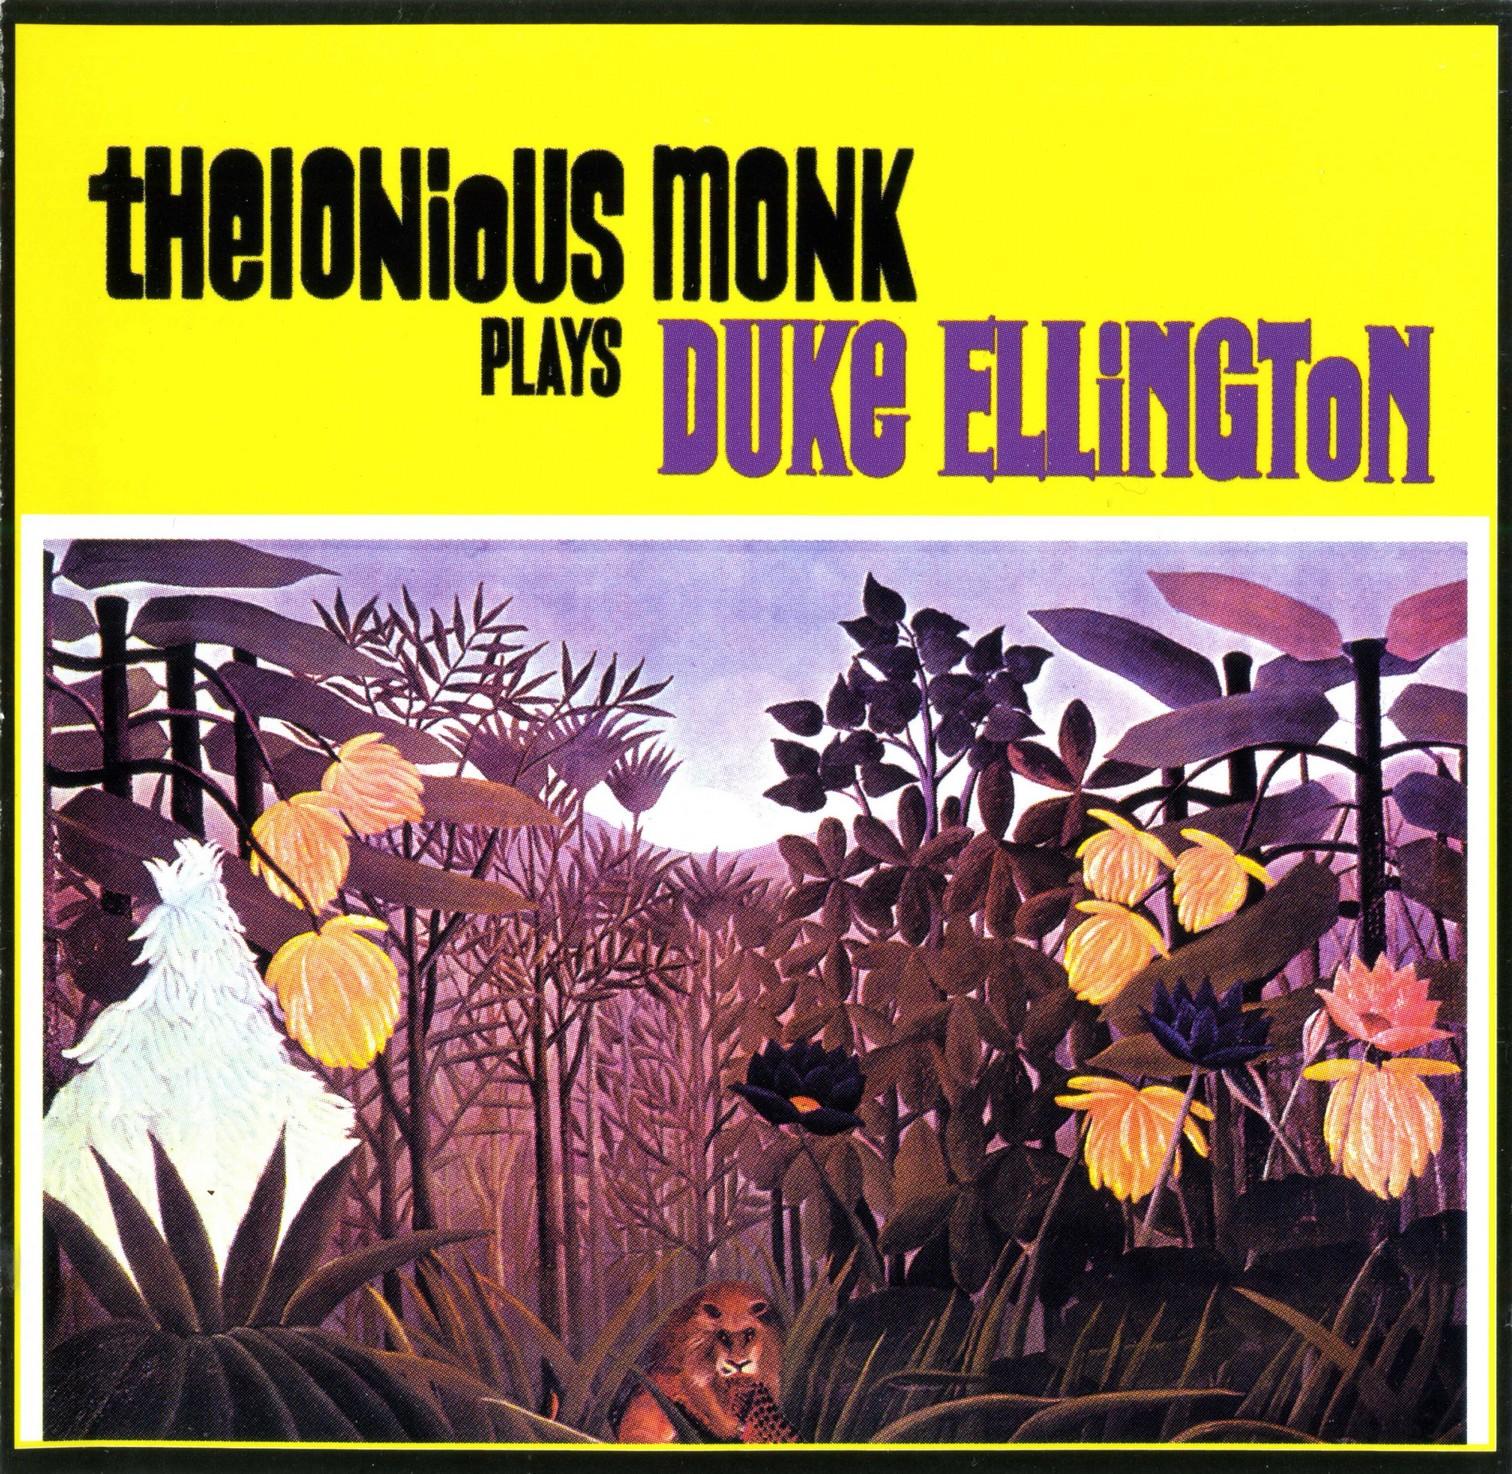 Duke Ellington - His Piano And Orchestra At The Bal Masque